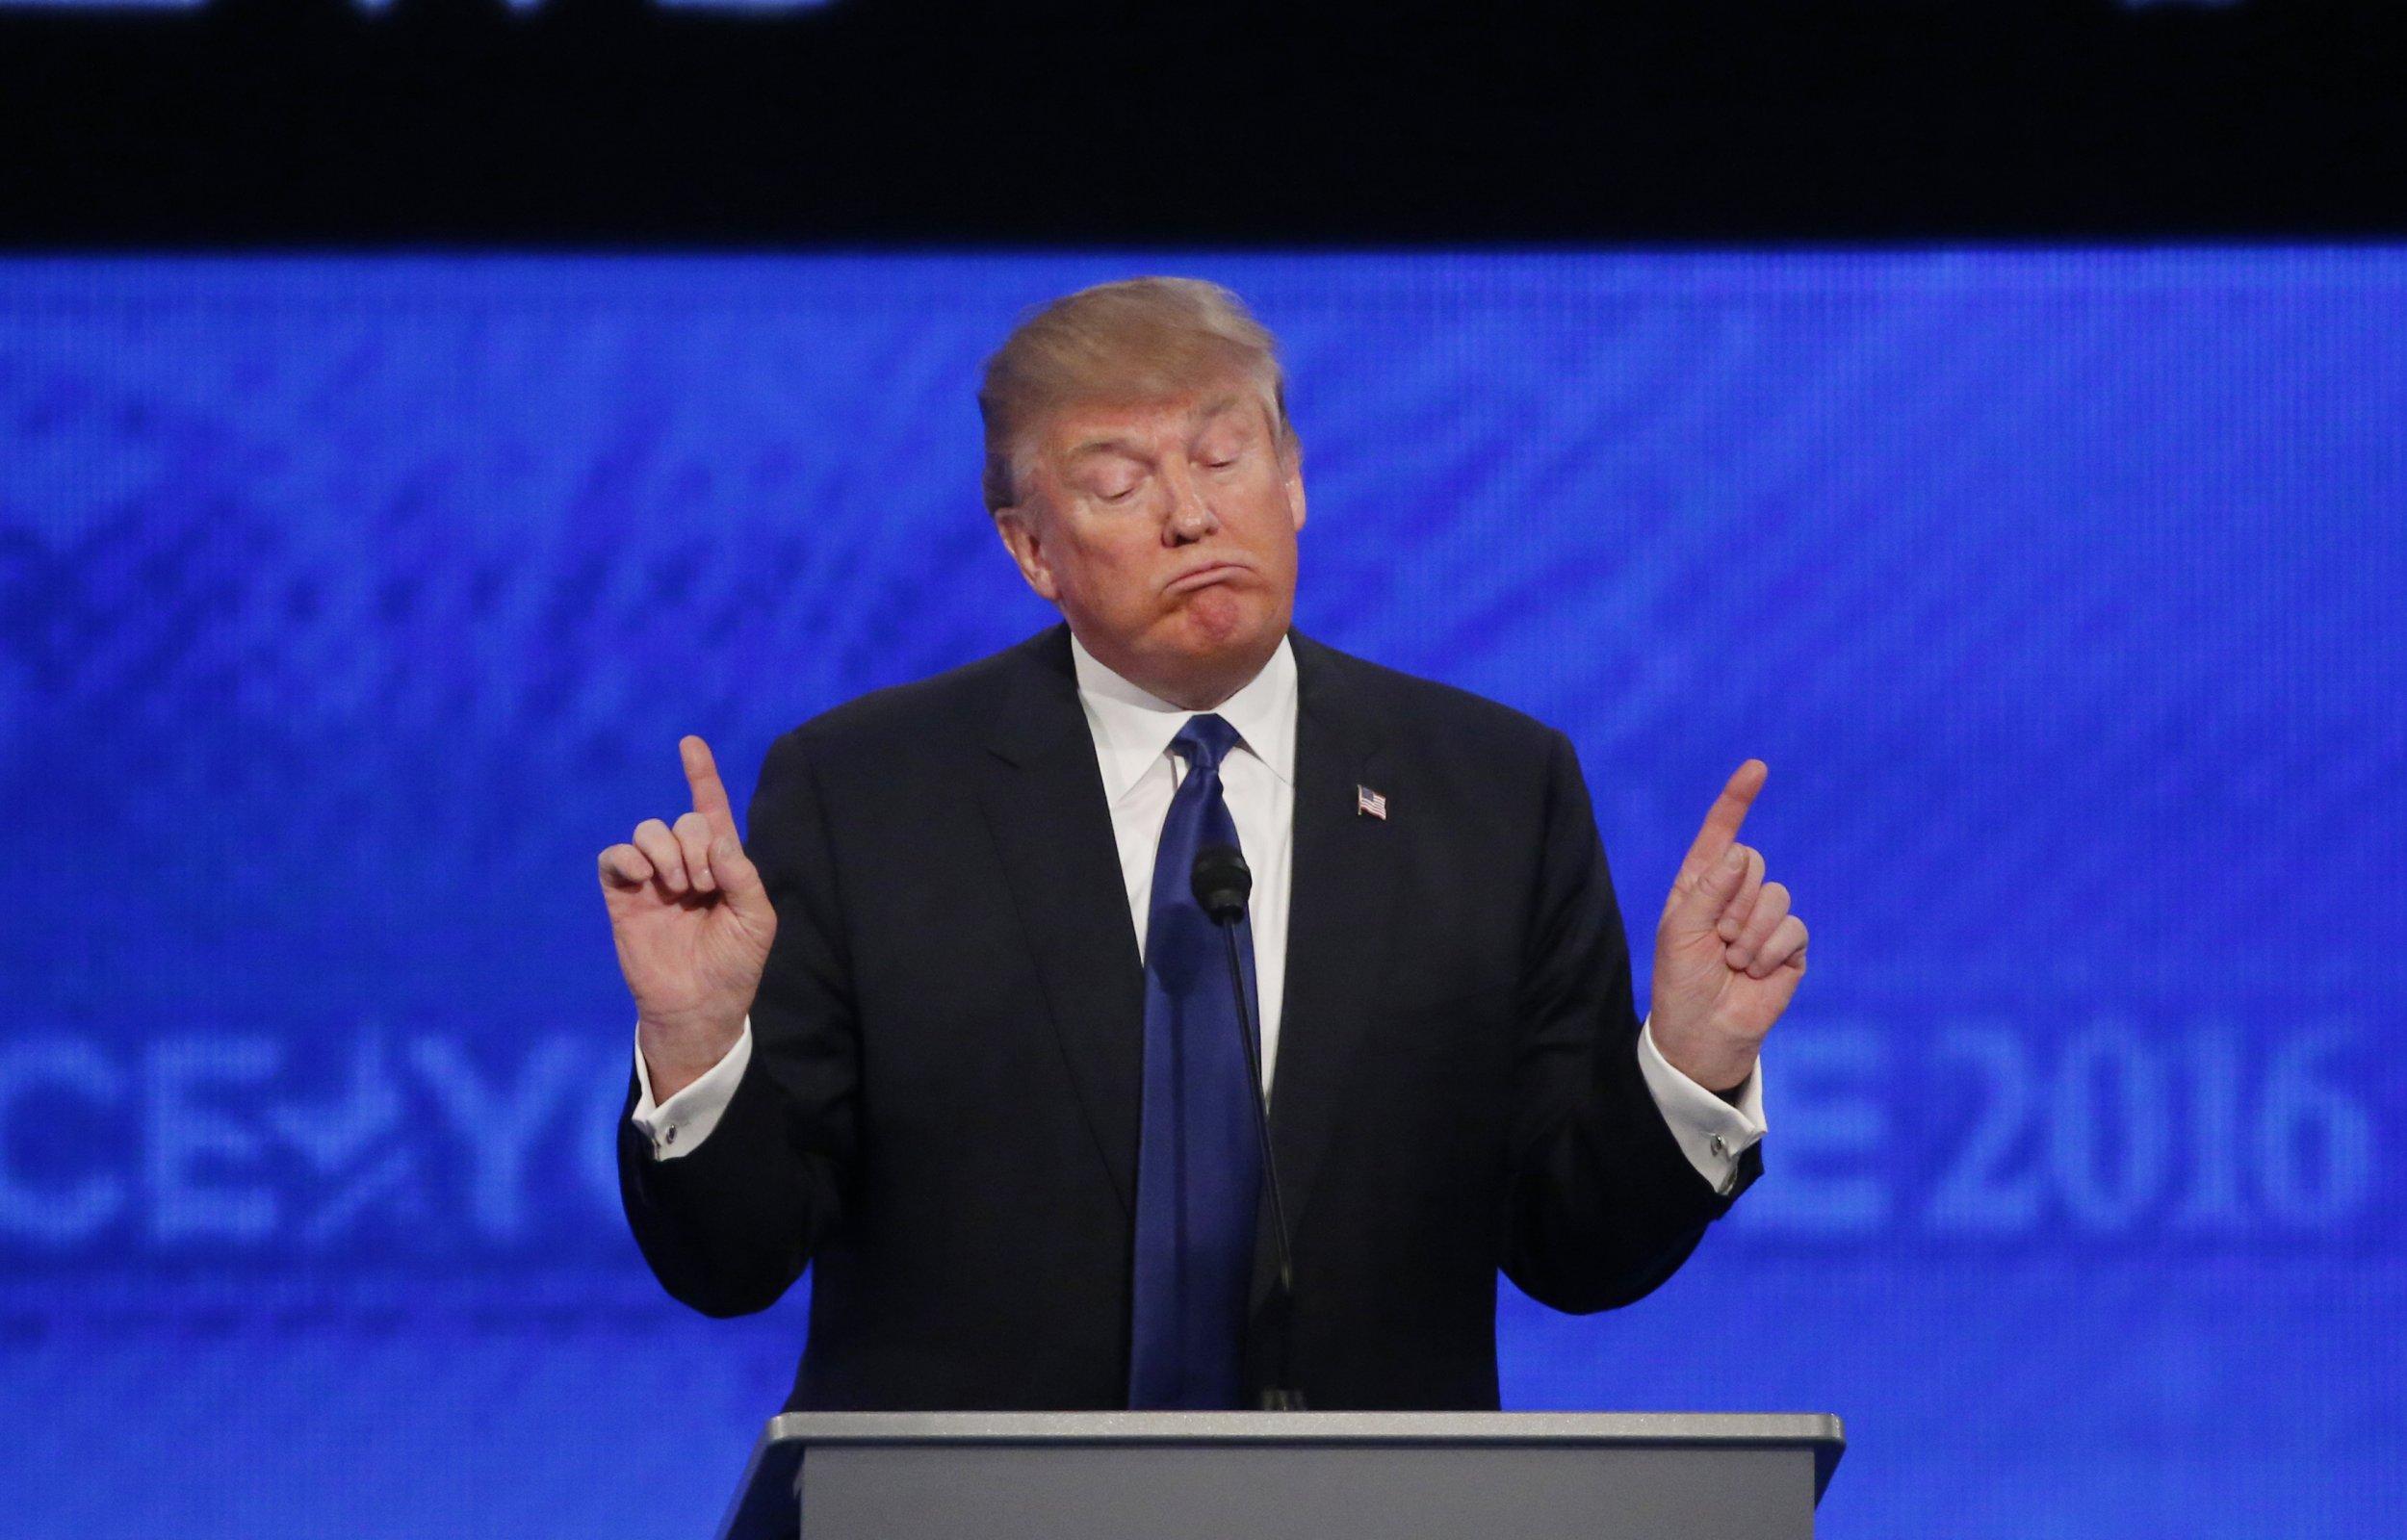 02_17_Trump_9/11_01